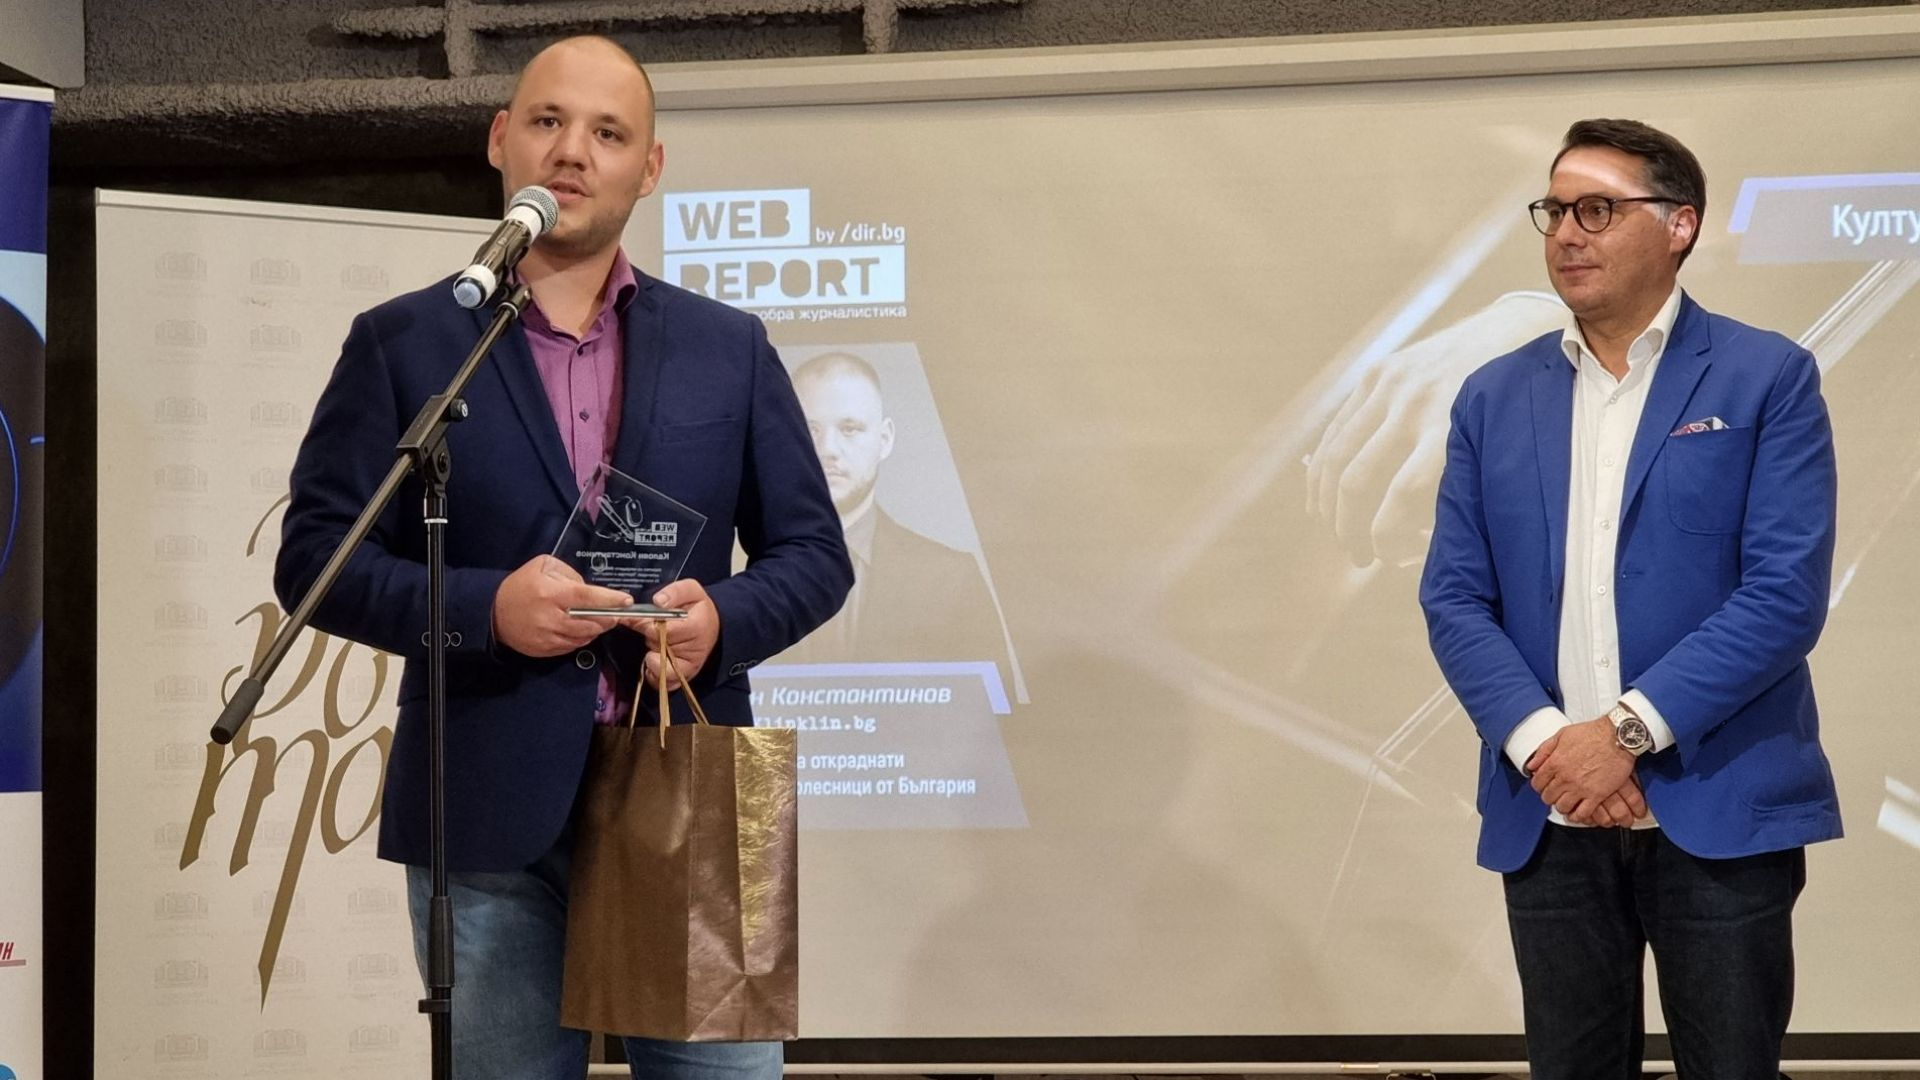 Борислав Велков връчи наградата на Калоян Велков.